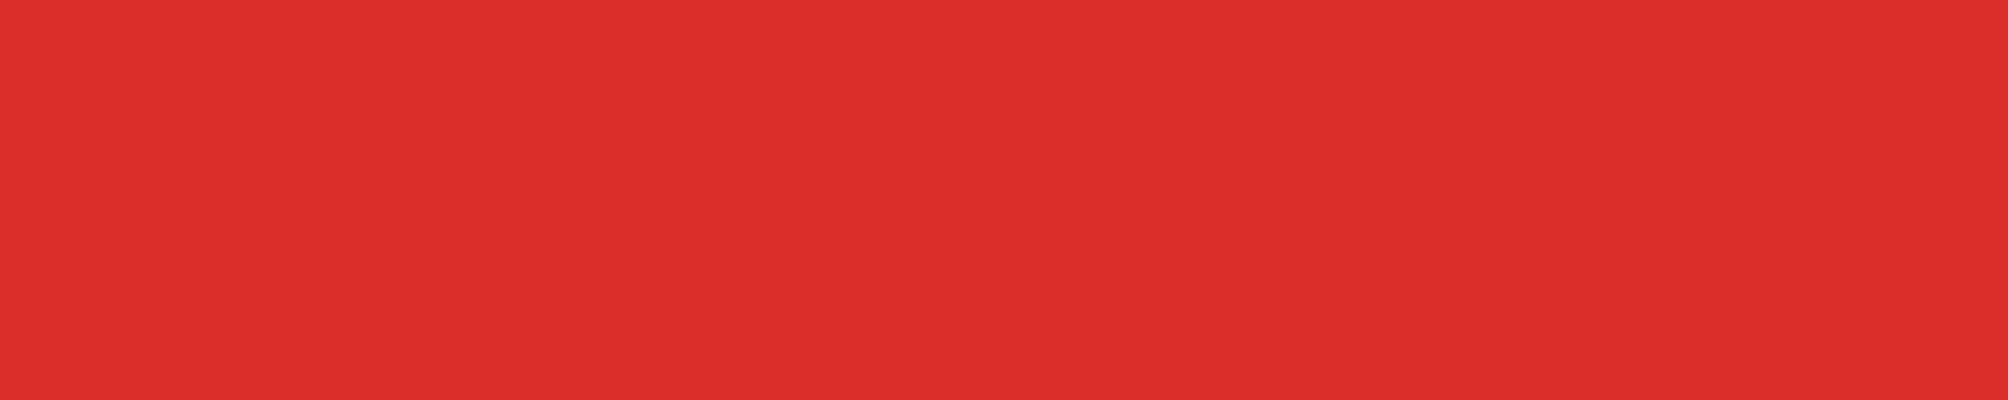 "<span style=""color: #ffffff;"">offres spéciales<br>bain</span> - Herobanner - HEMA"